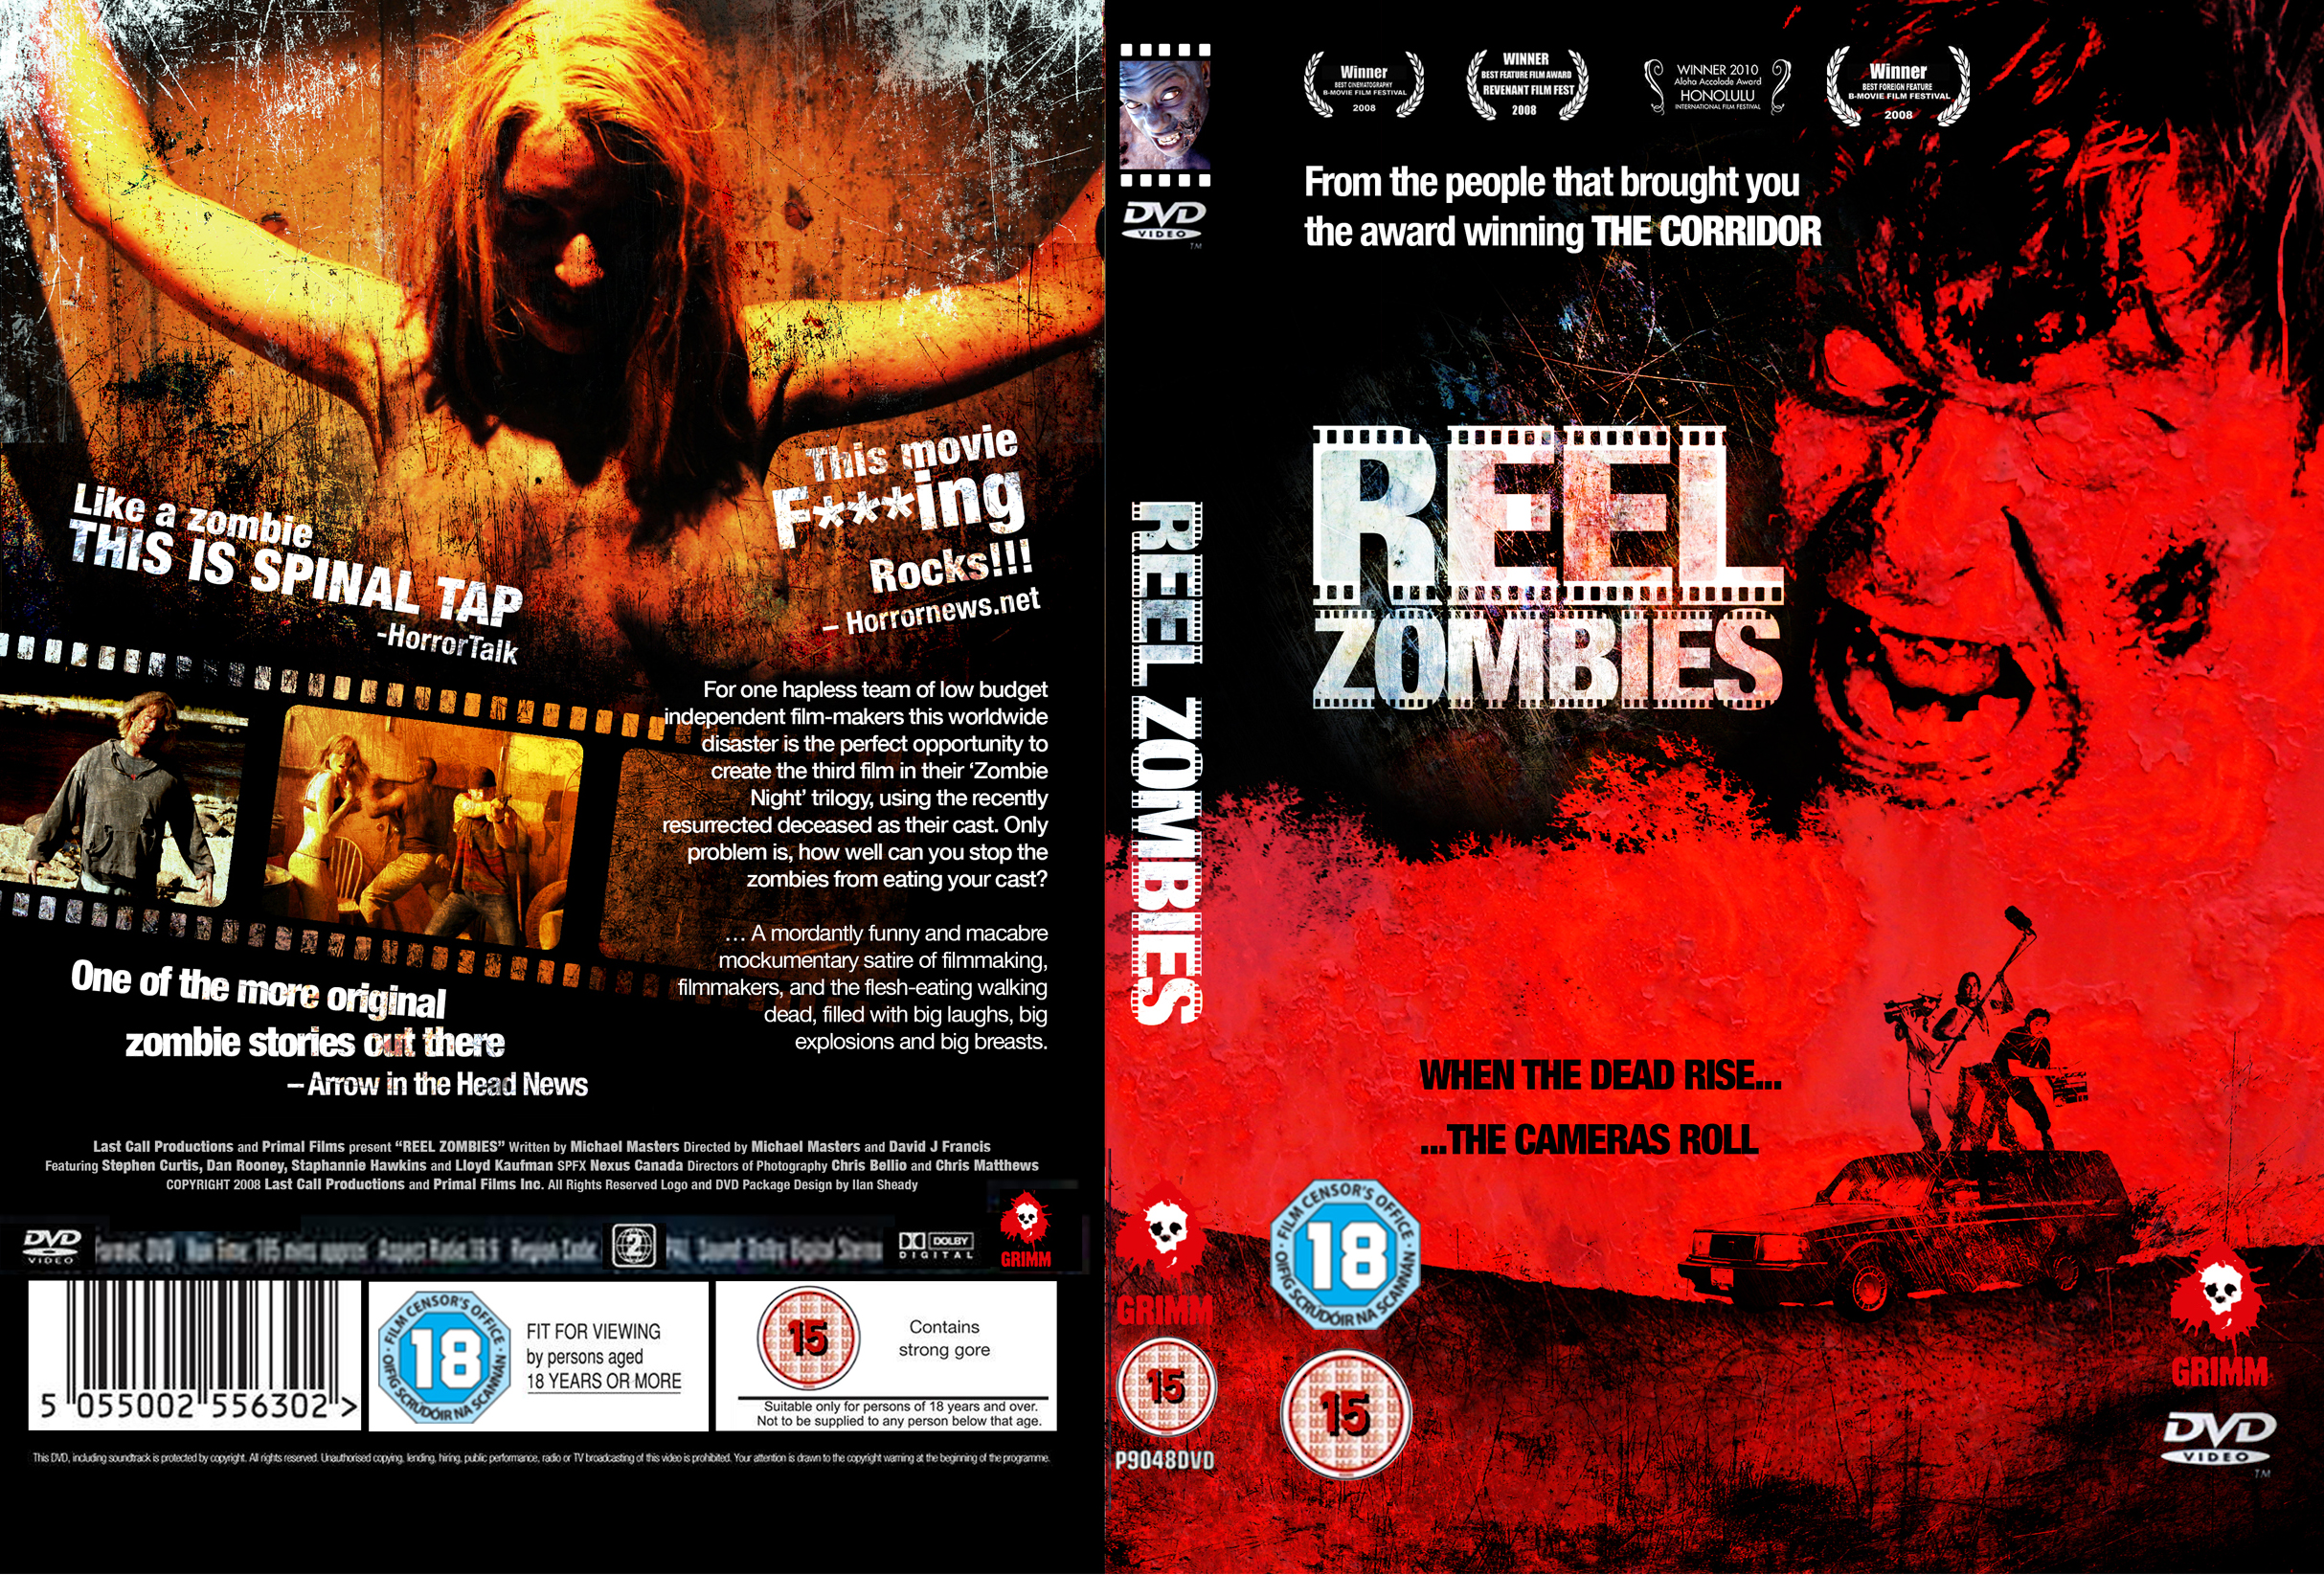 Reel Zombies DVD Wrap